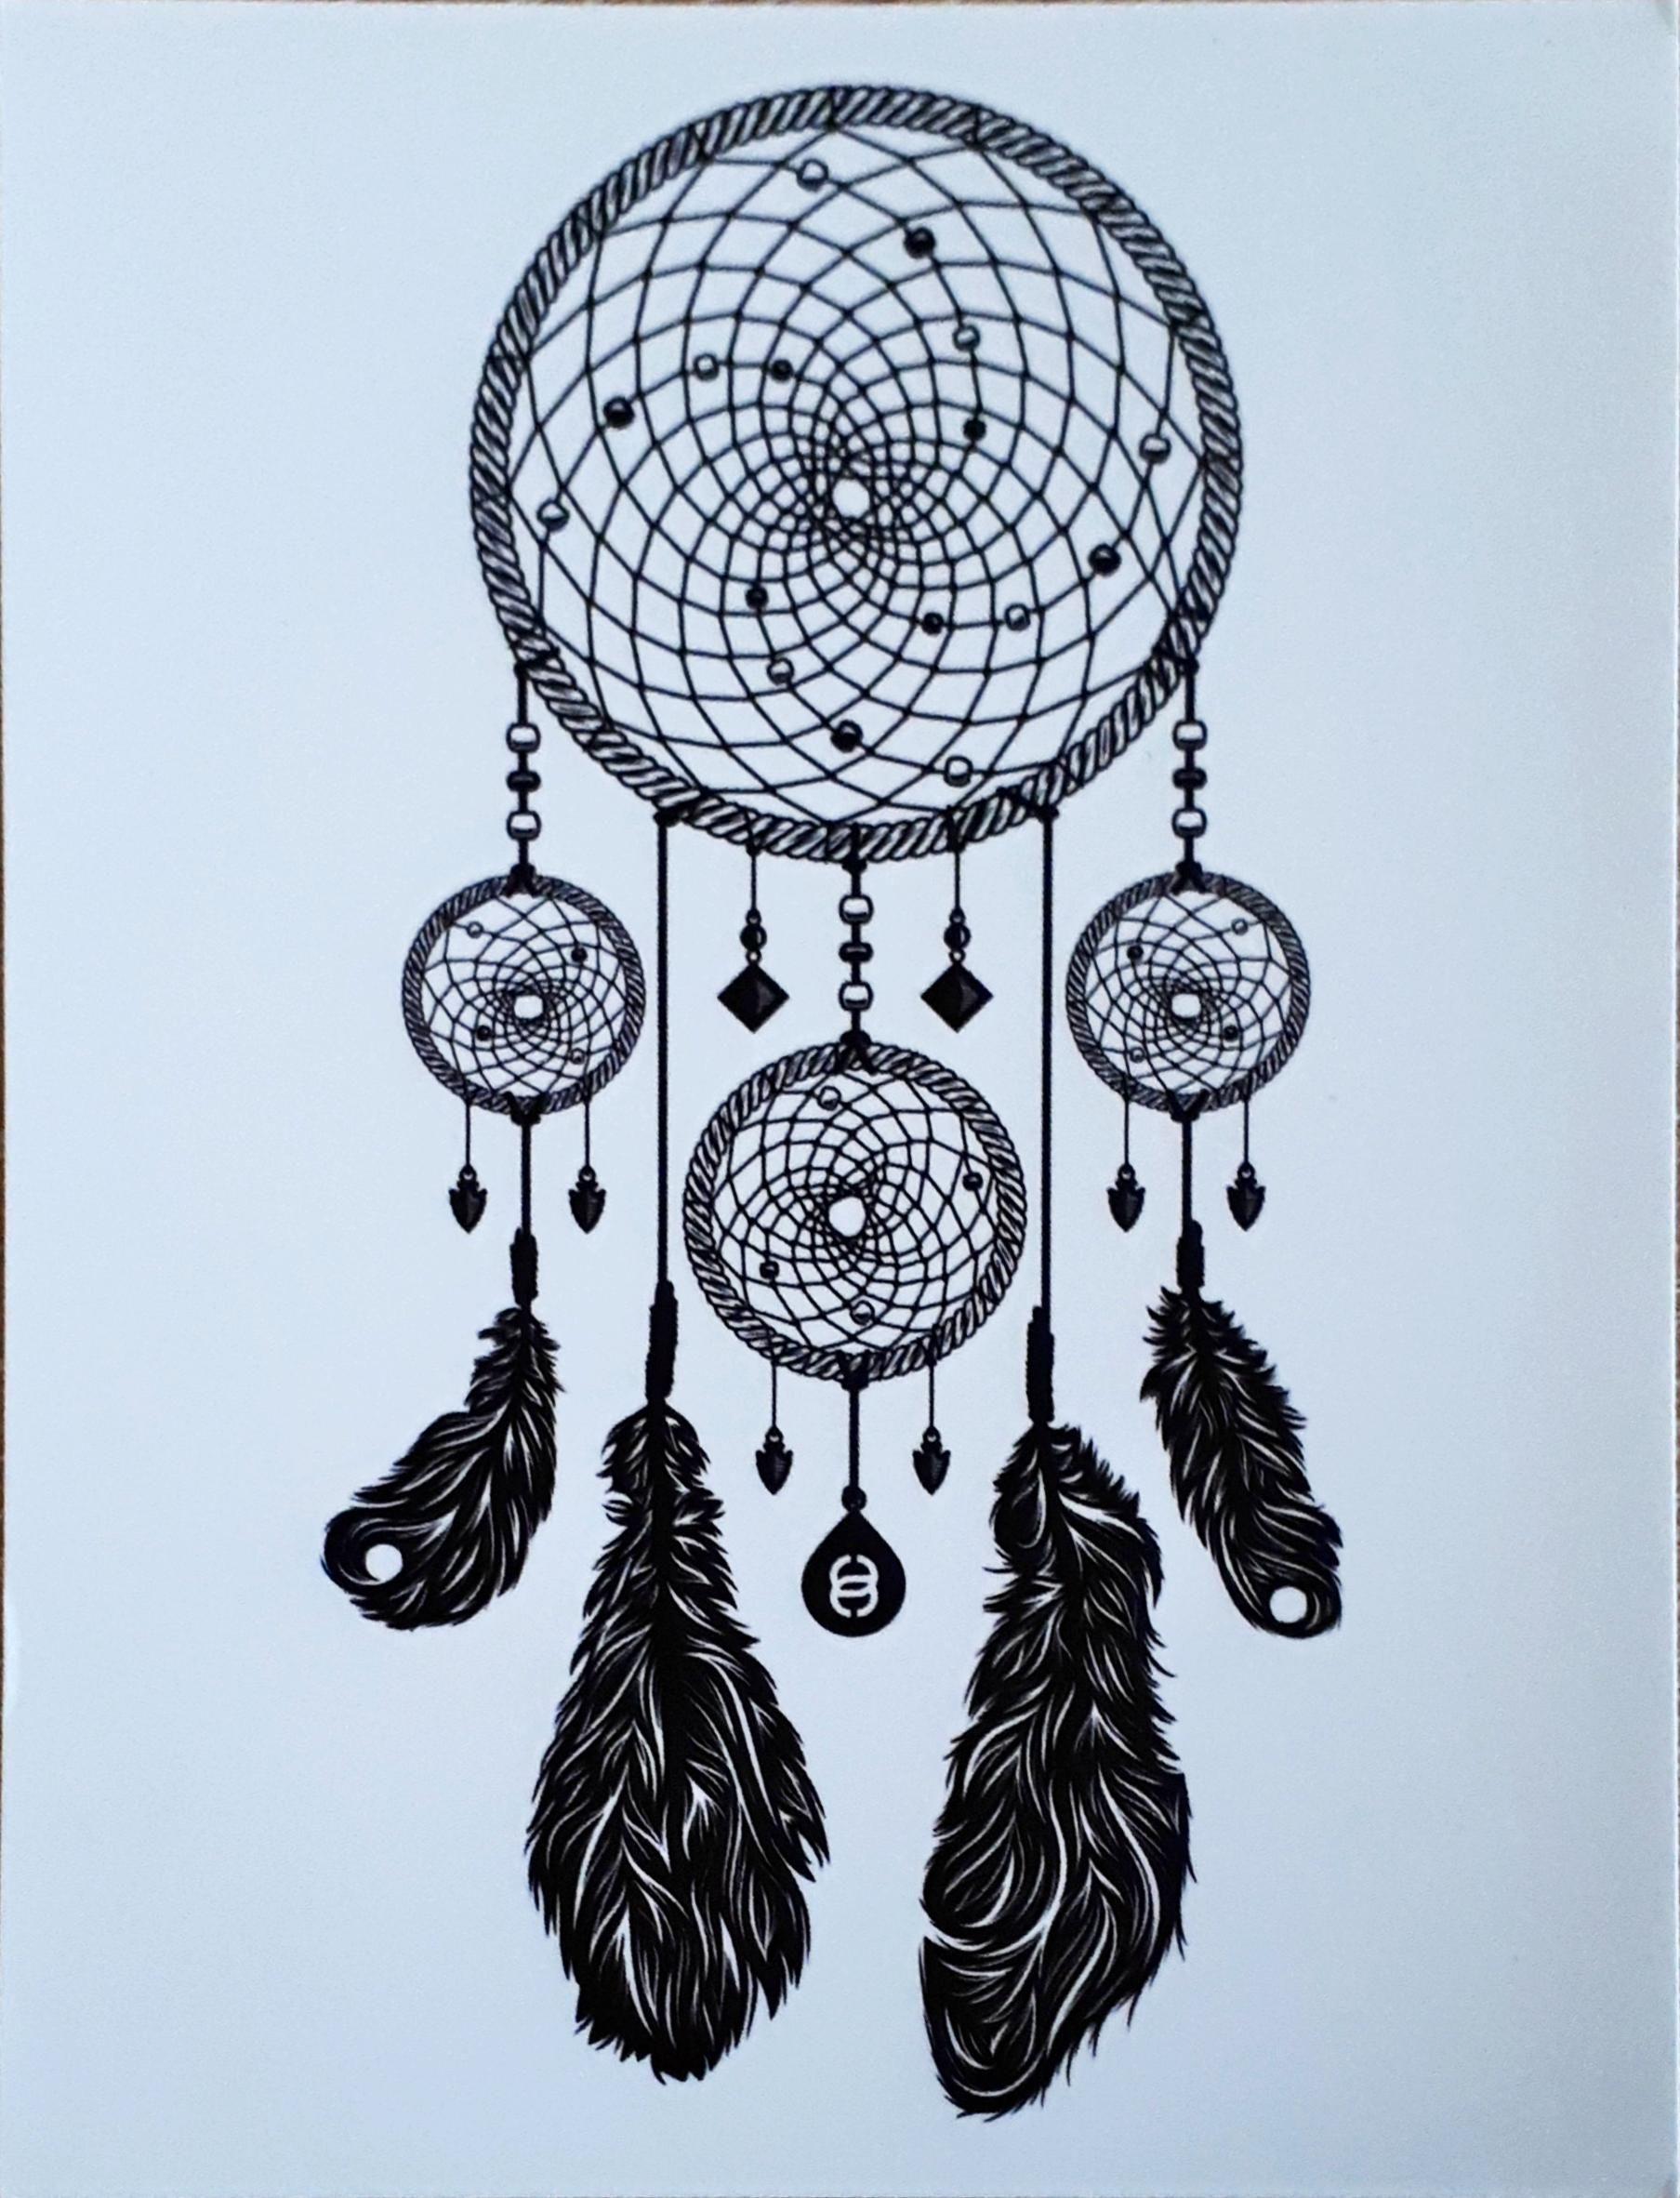 Pin by Nans2linds on Misc Black white art, White art